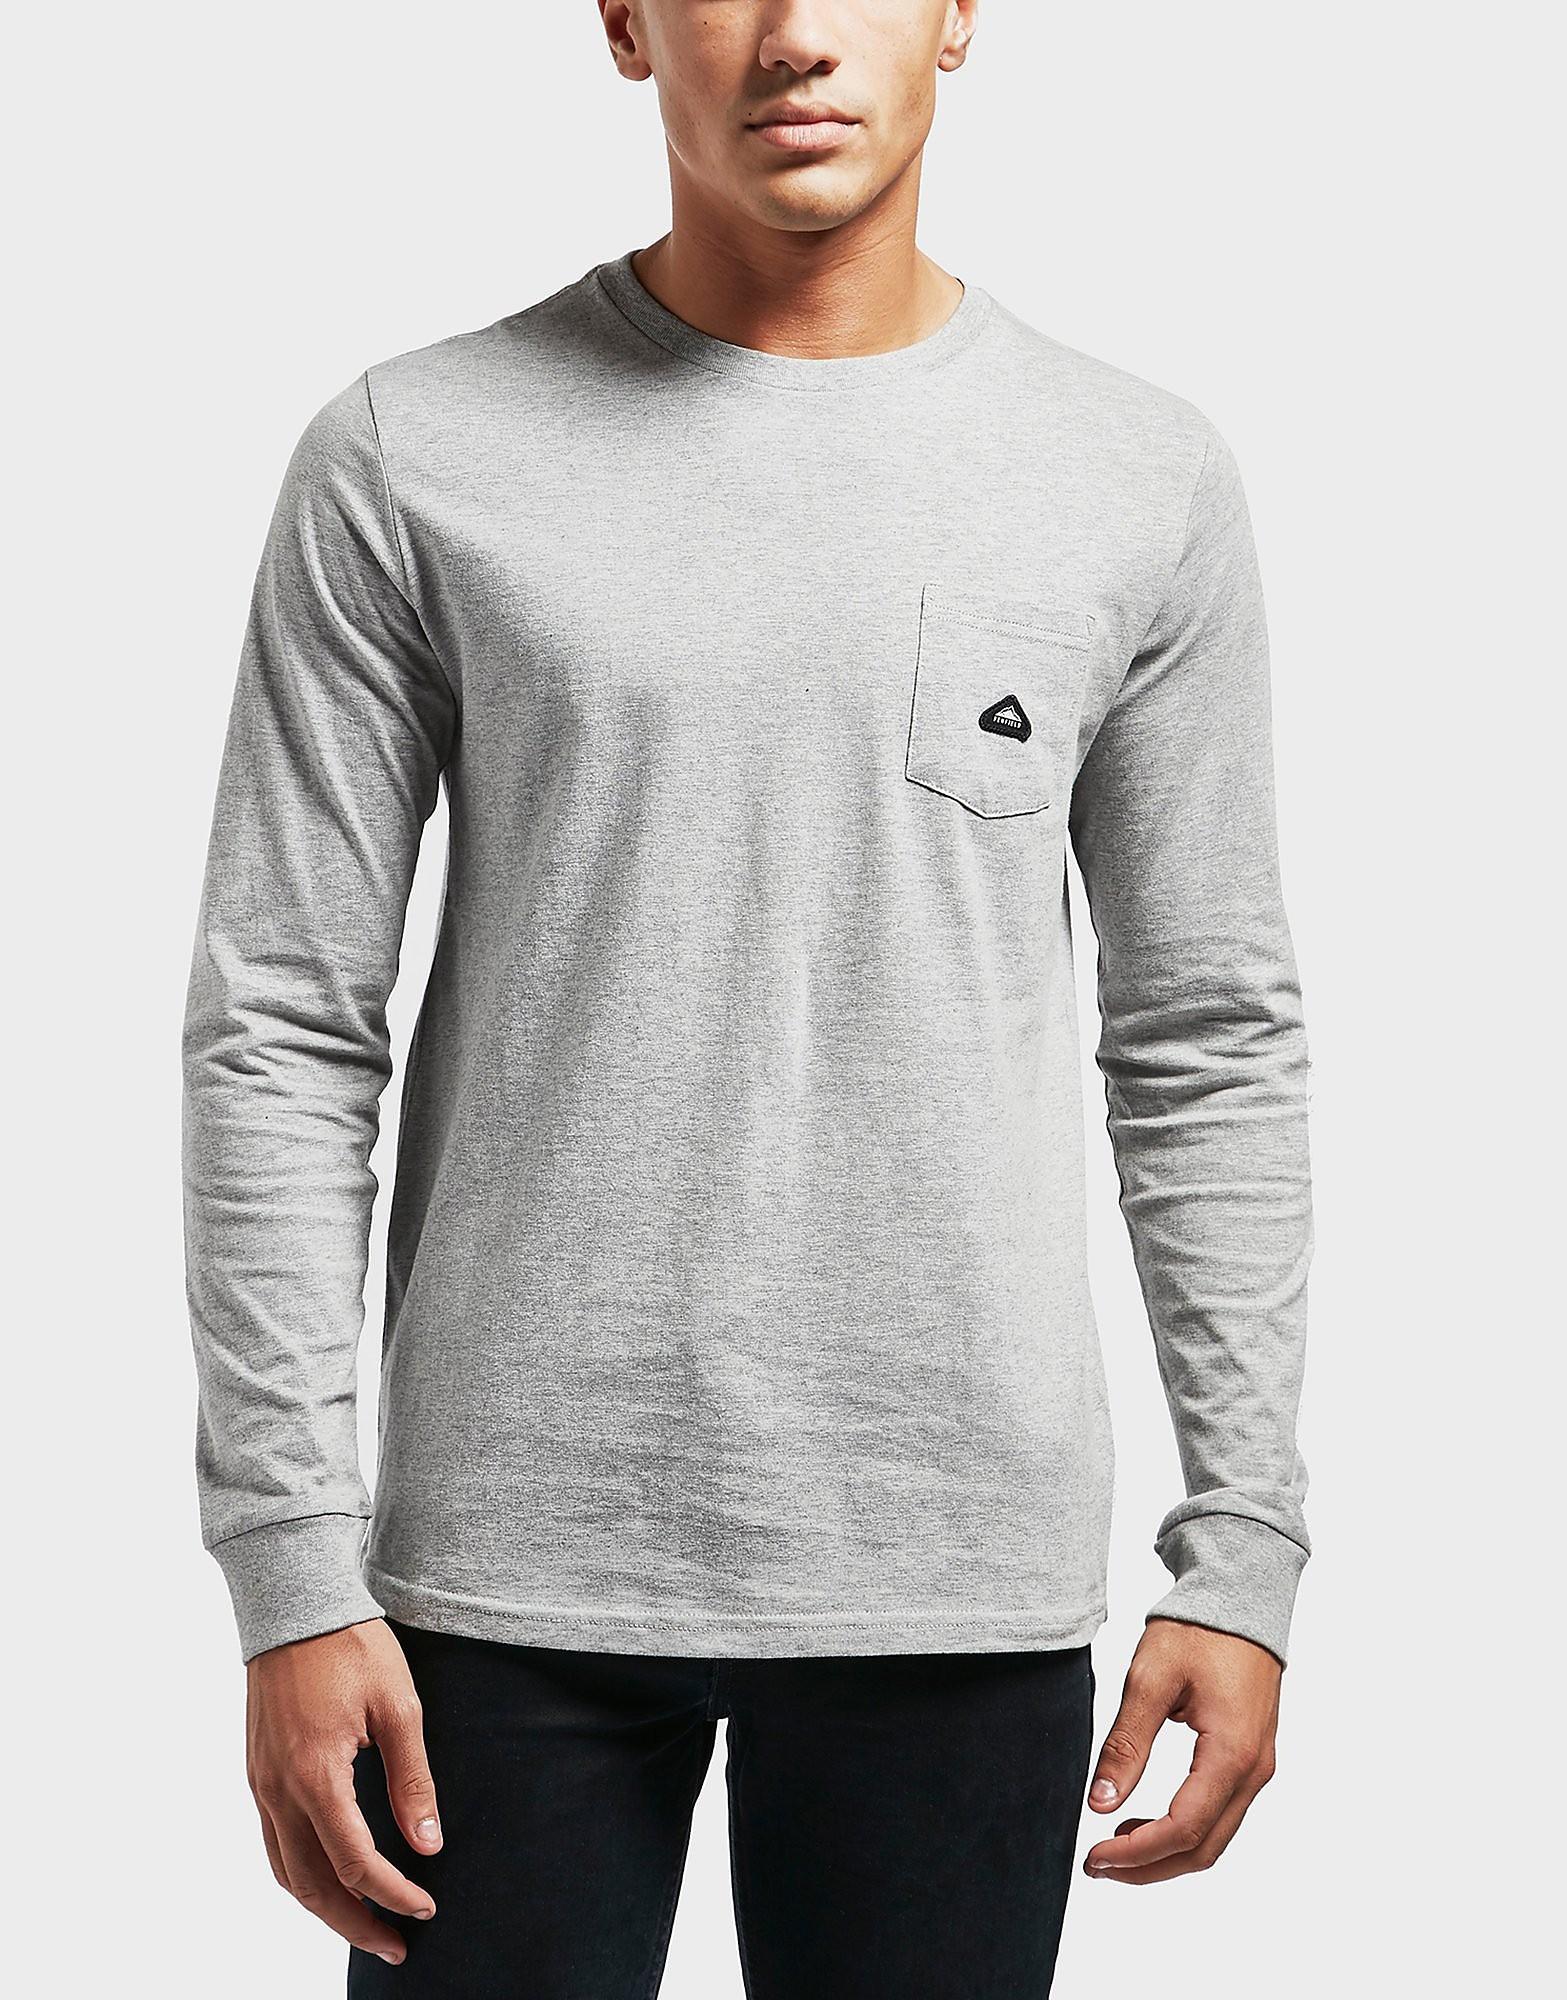 Penfield Northbridge Long Sleeve T-Shirt